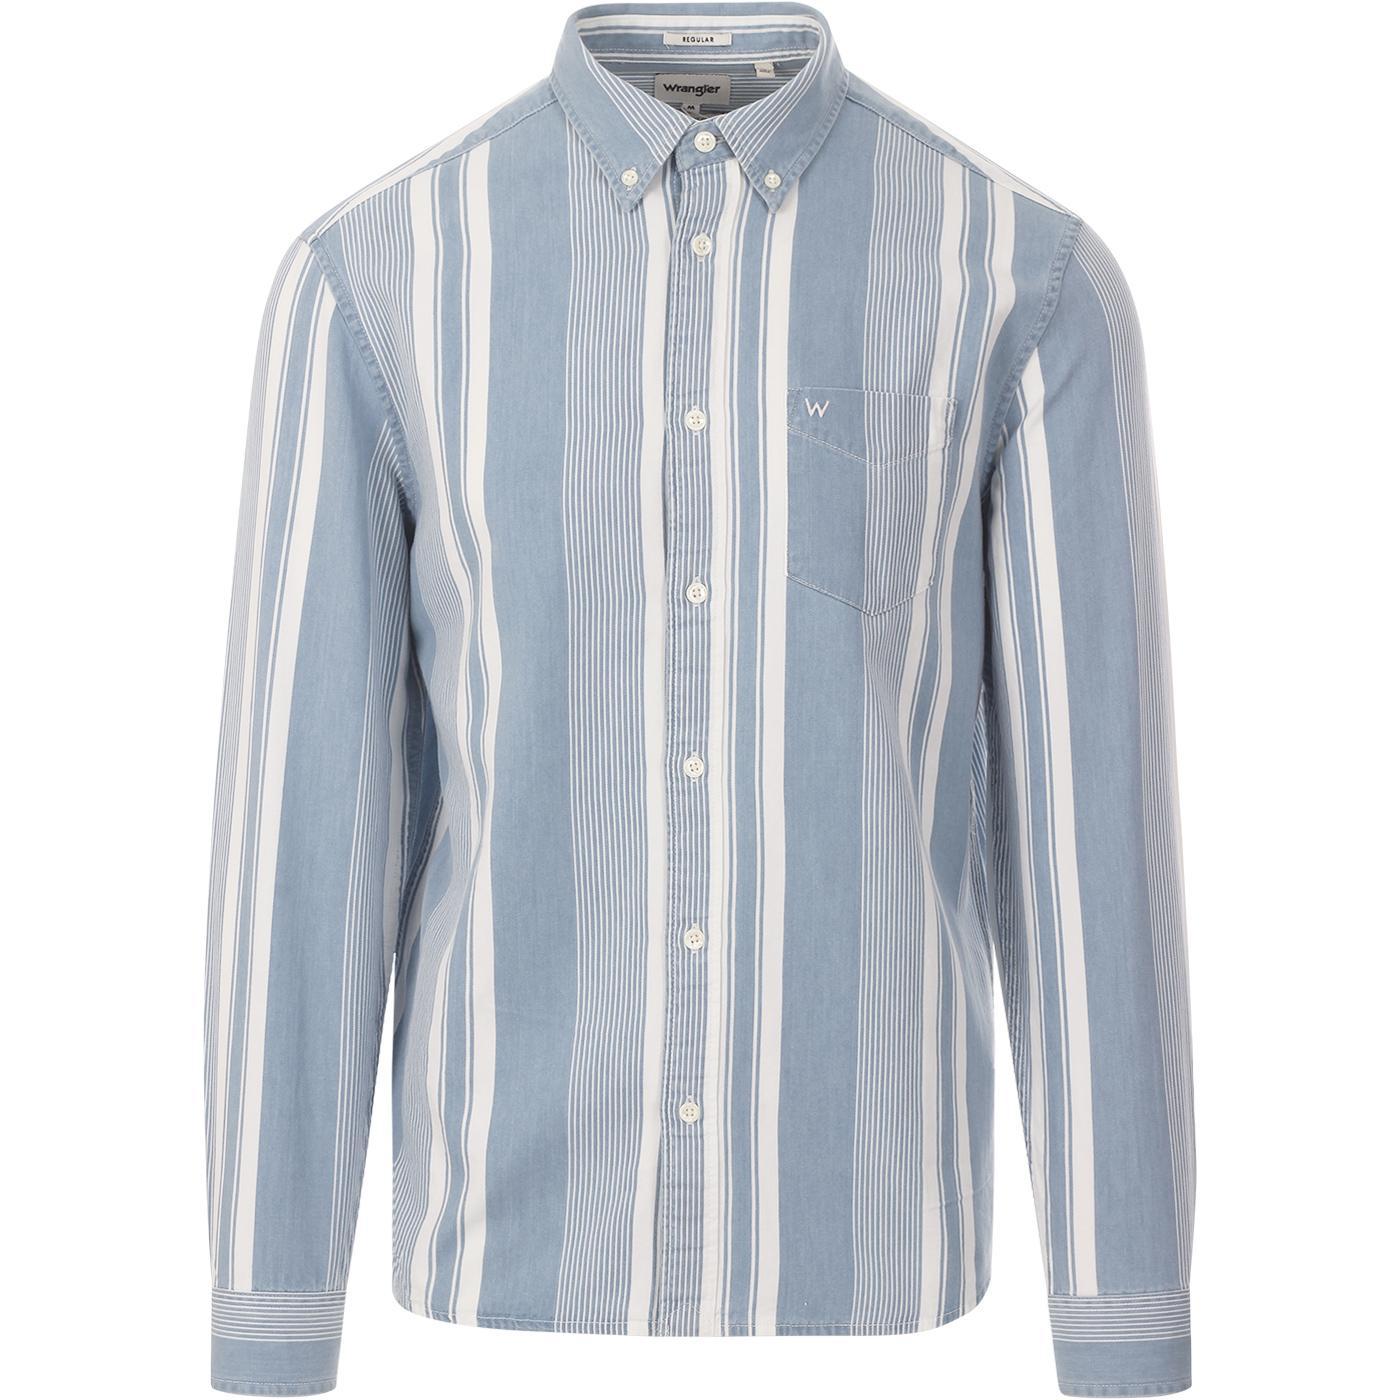 WRANGLER Mod Stripe Button Down Shirt LIGHT INDIGO